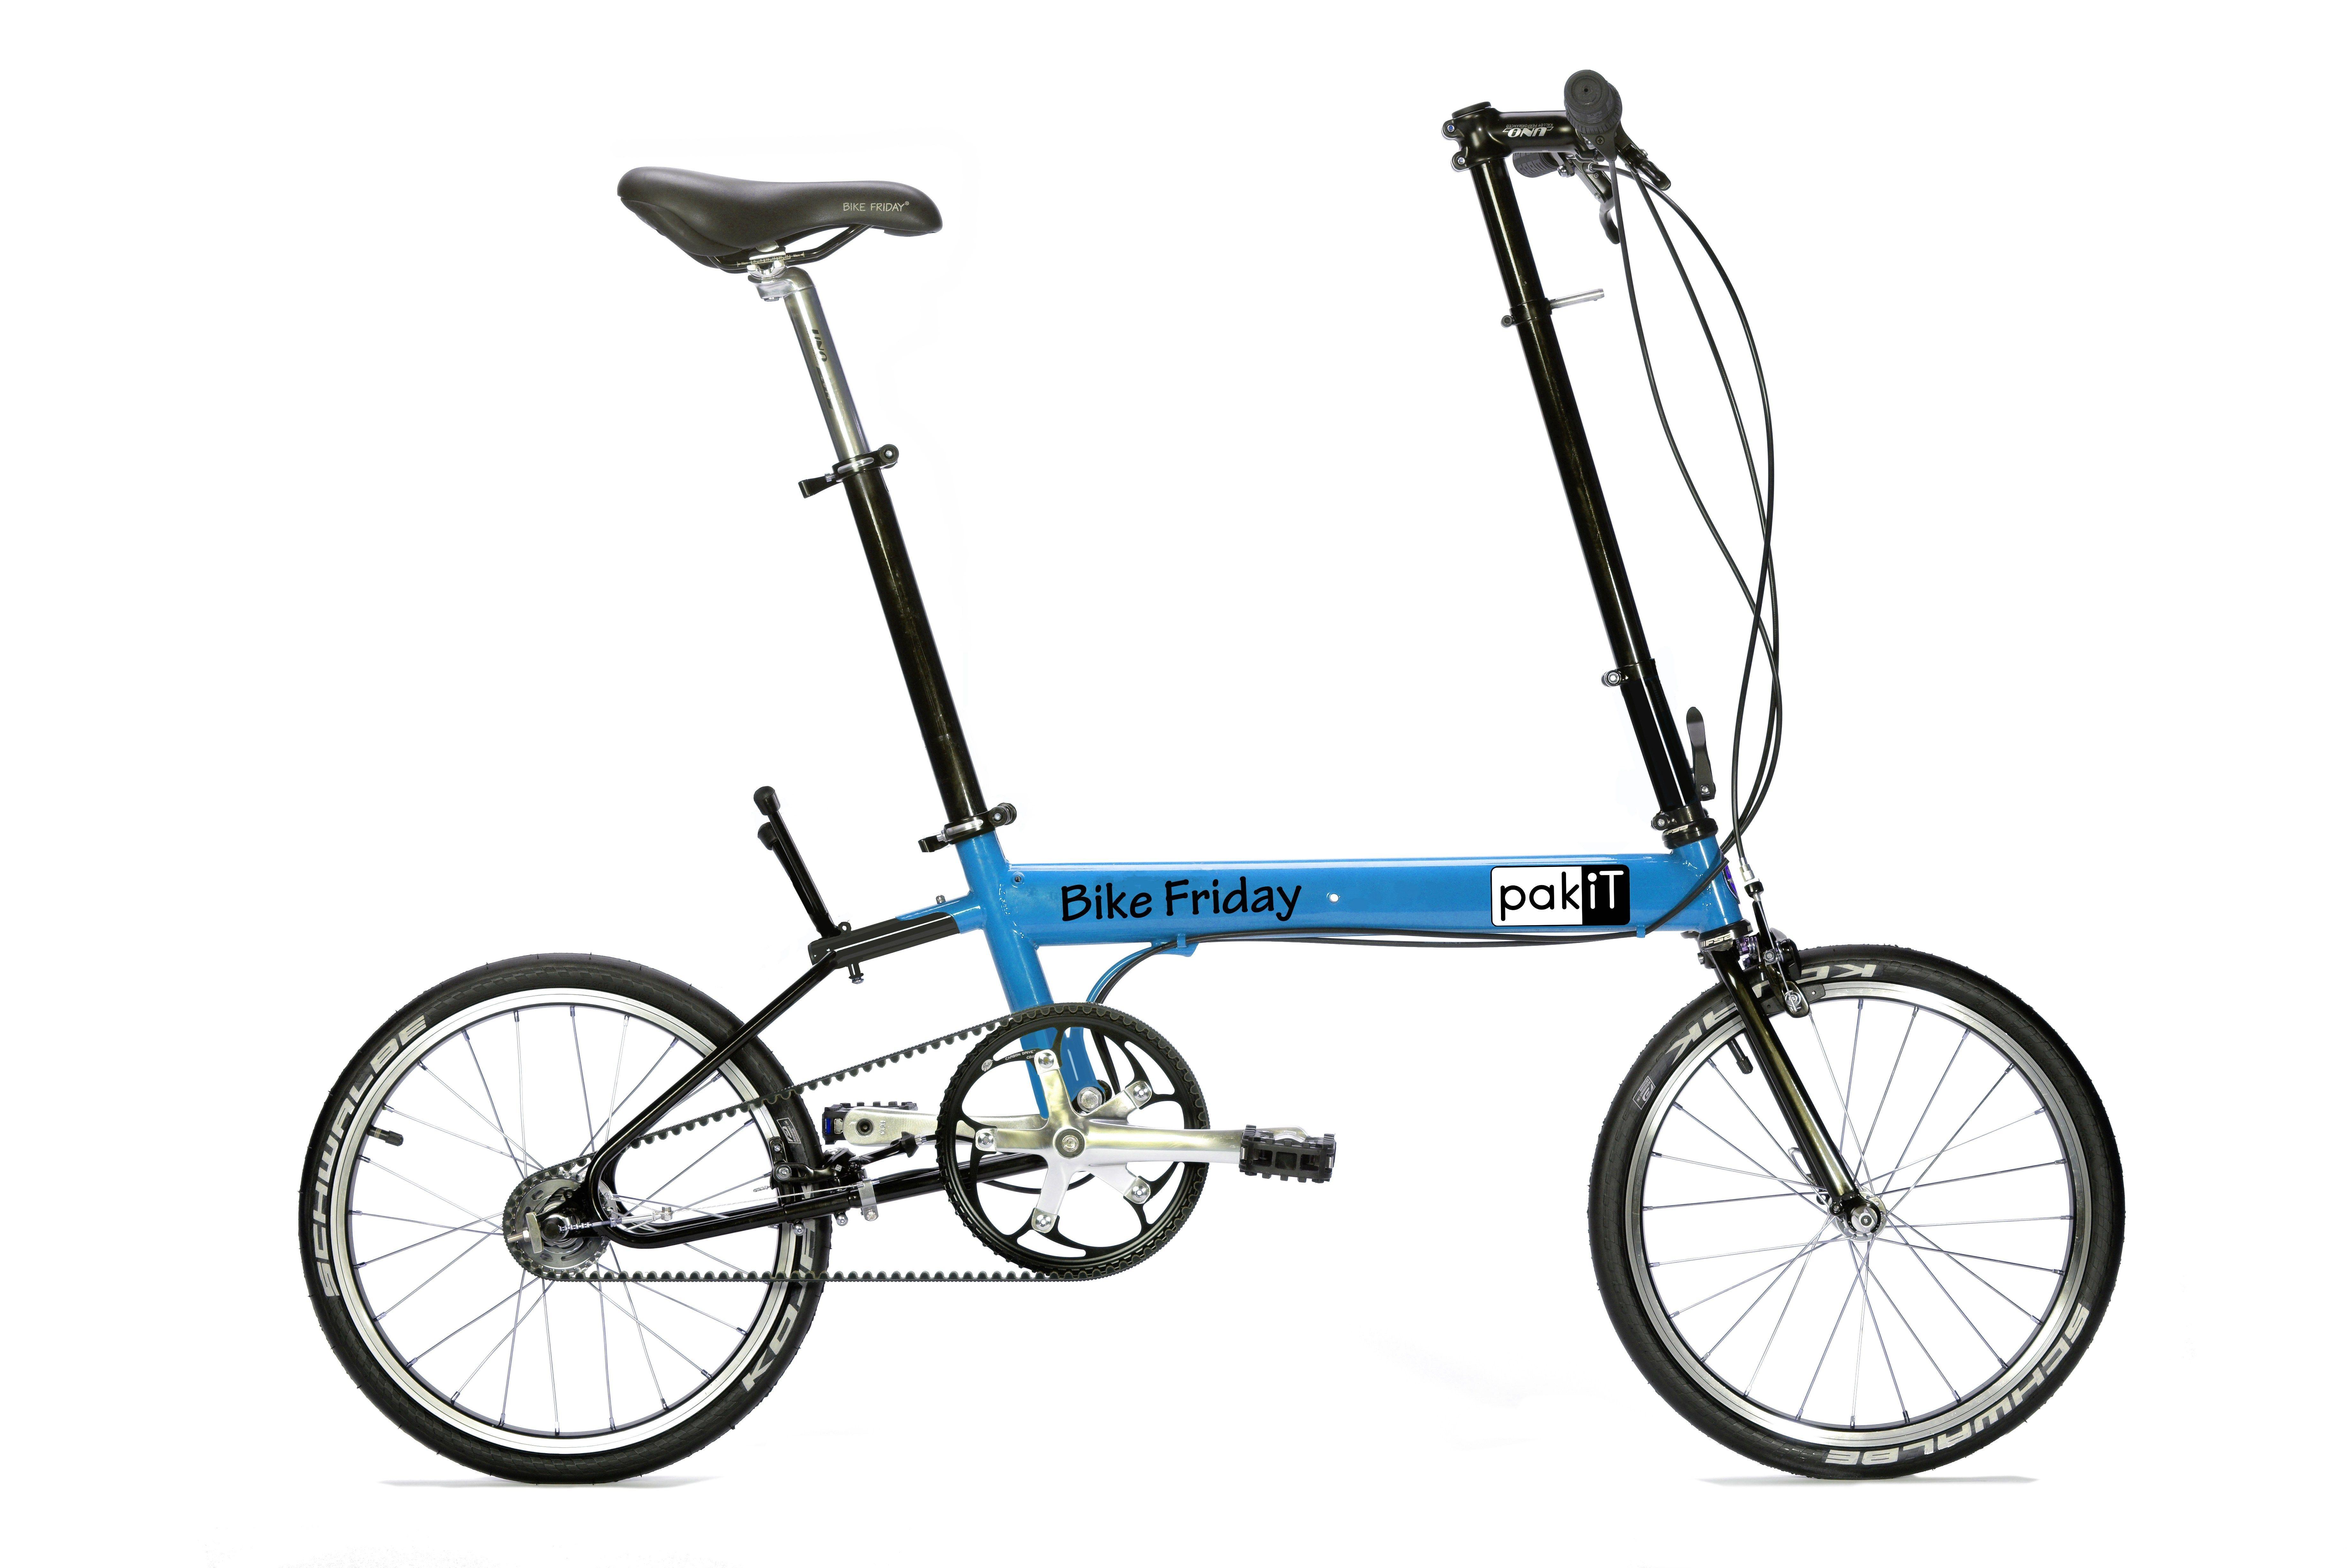 Pakit Compact Folding Bike In 2020 Bike Friday Folding Bike